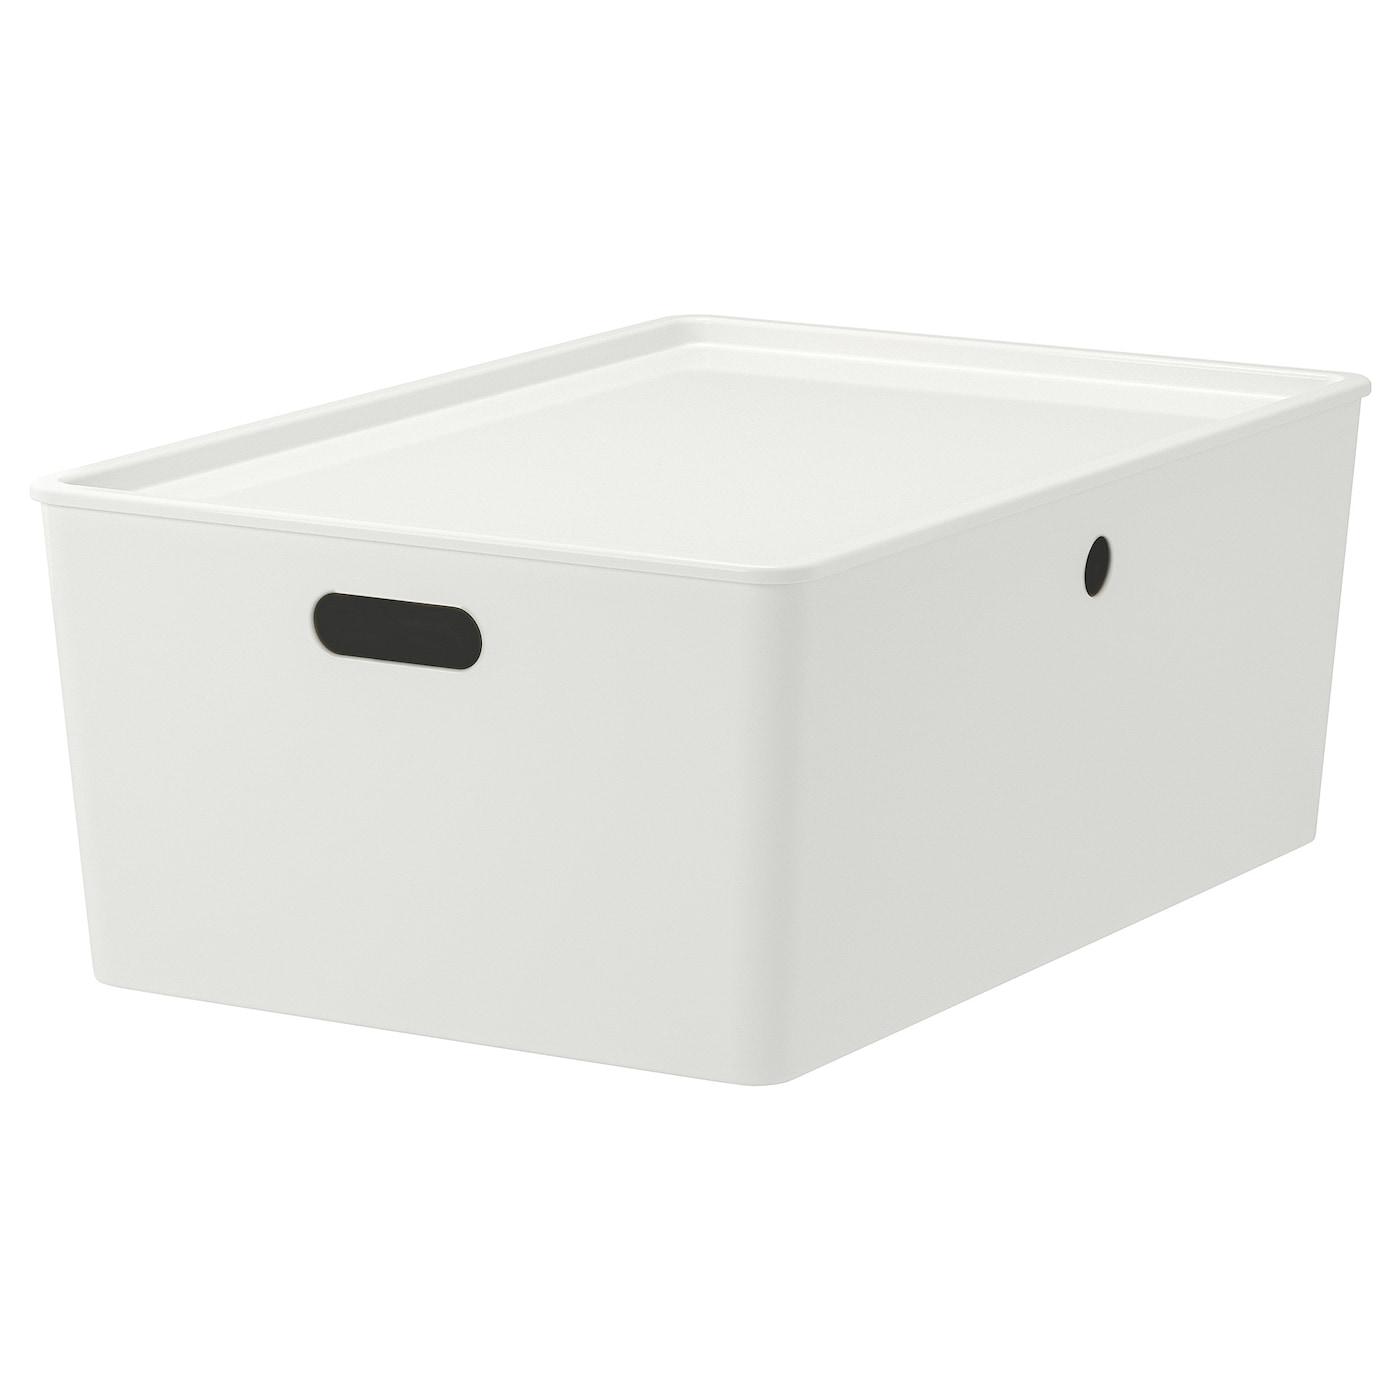 KUGGIS Boîte avec couvercle - blanc 16x16x16 cm